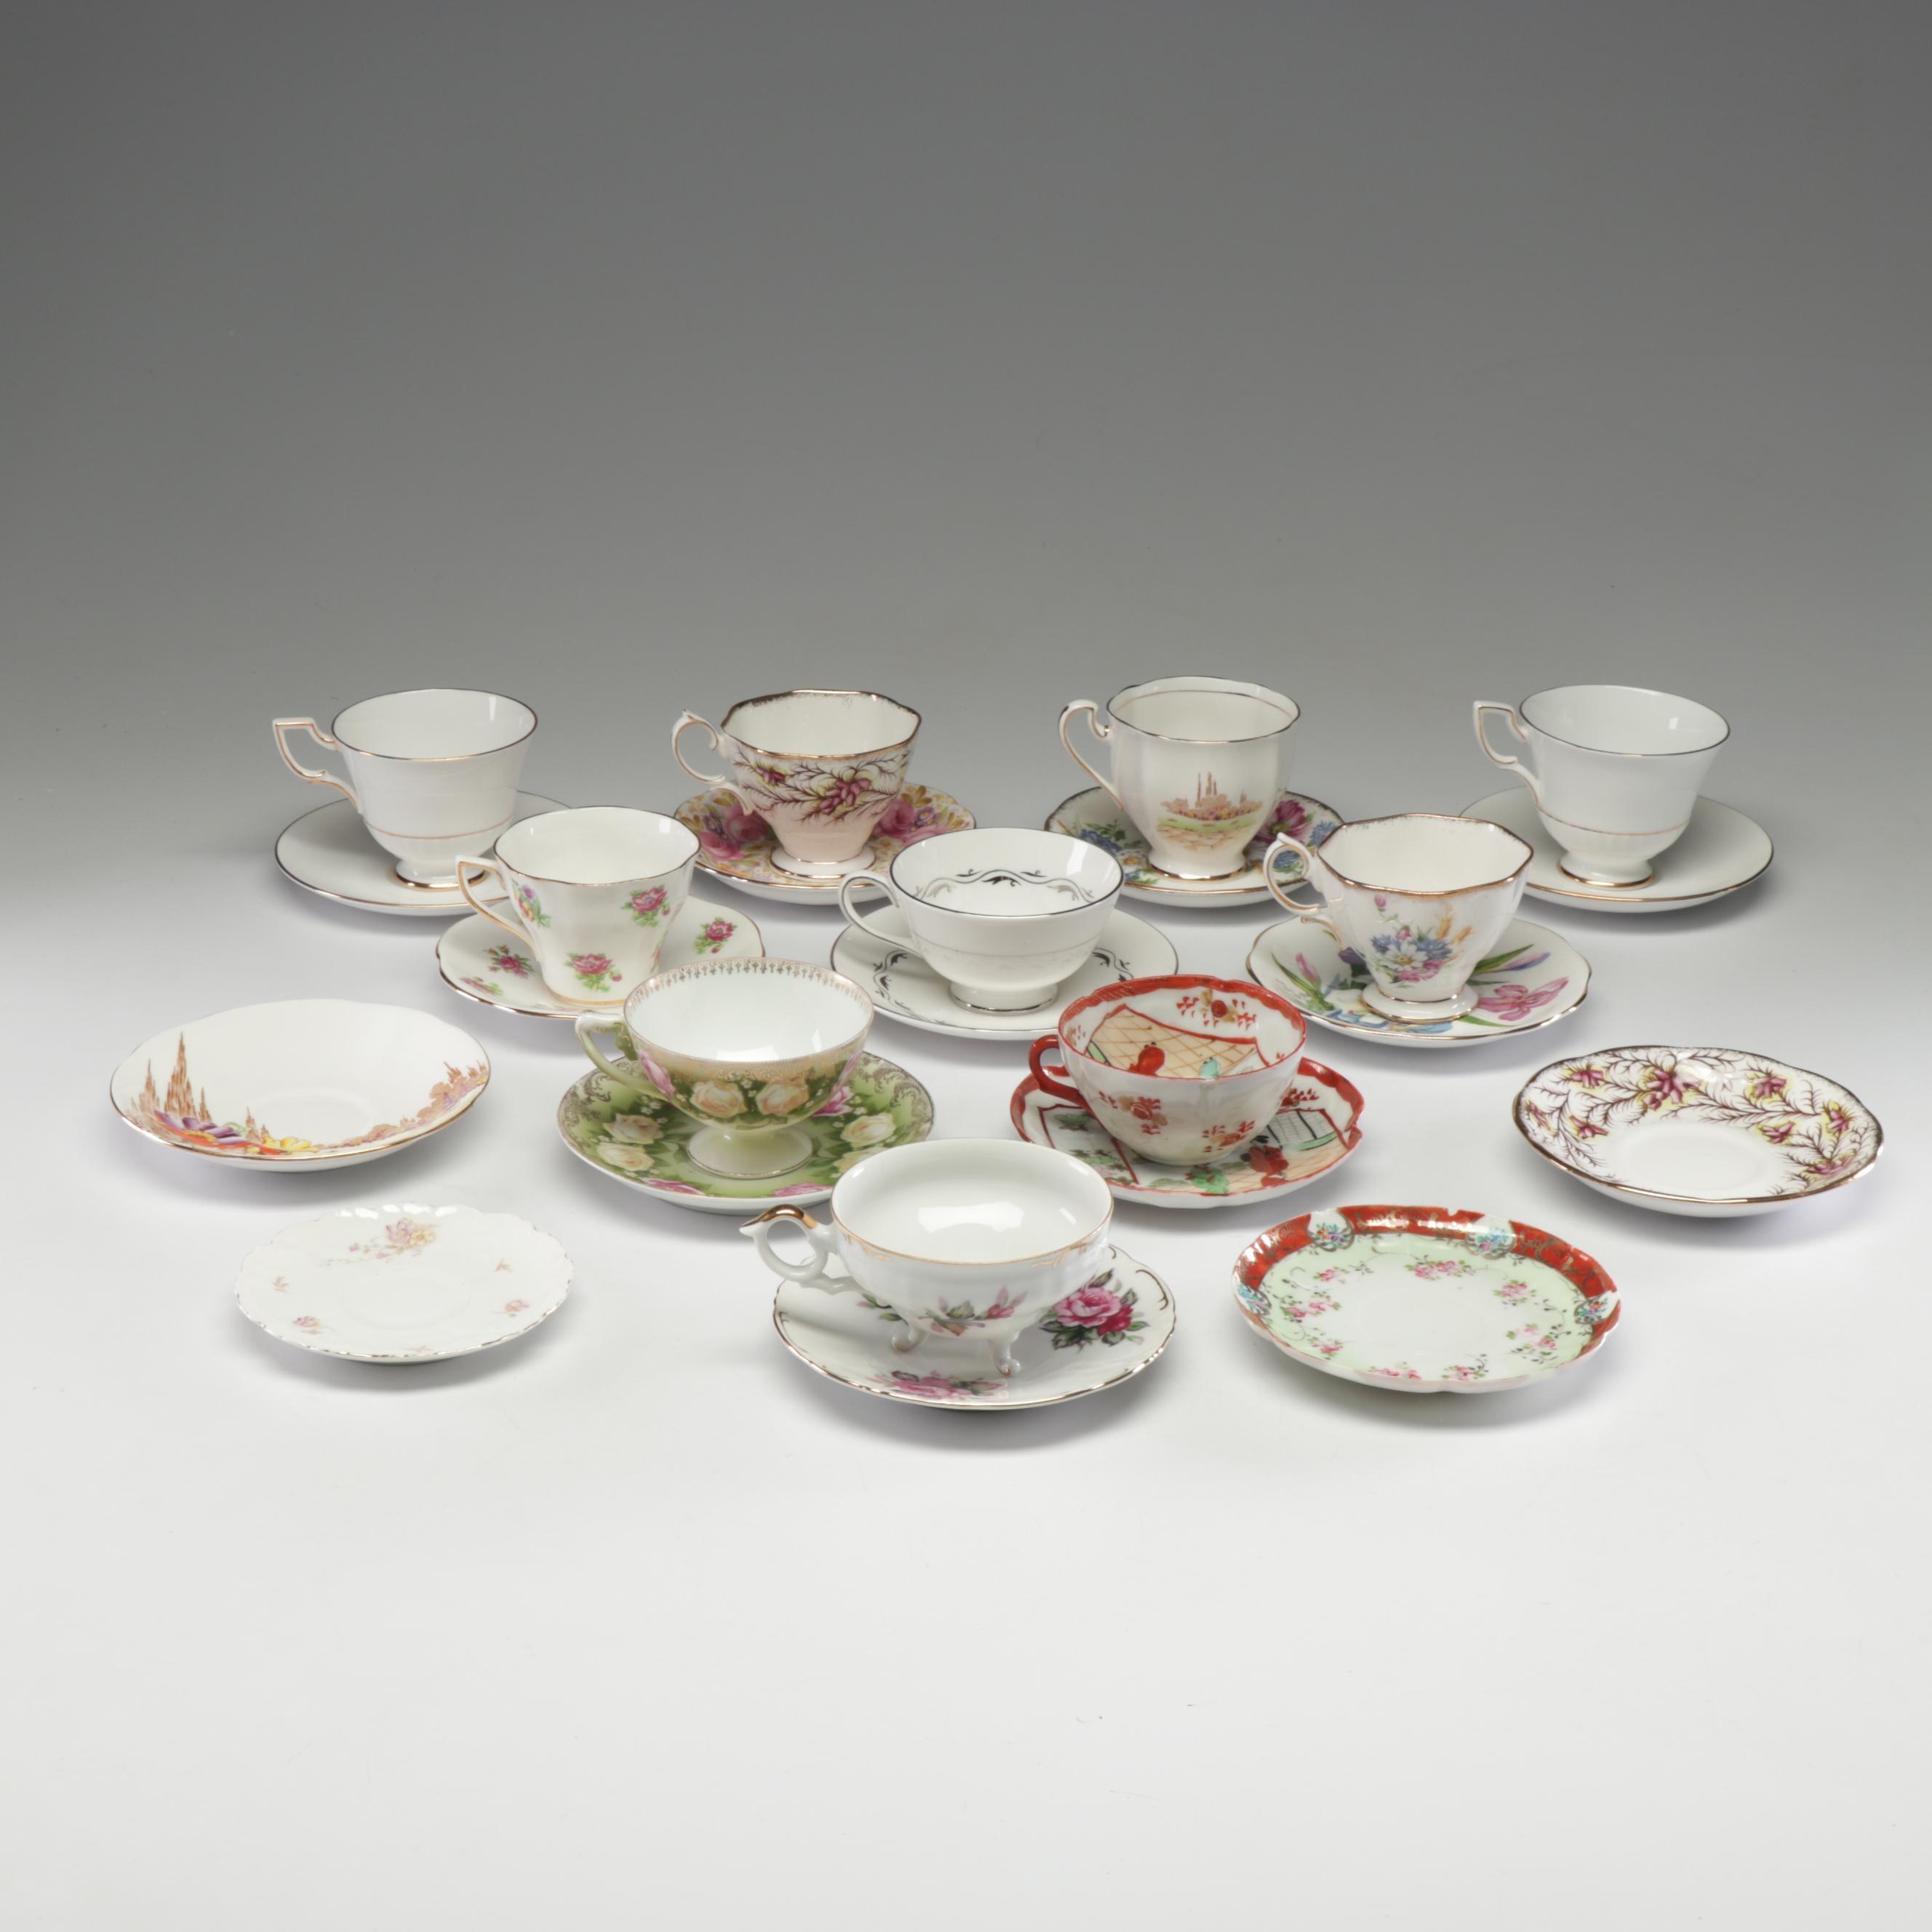 European and East Asian Bone China and Porcelain Tea Settings